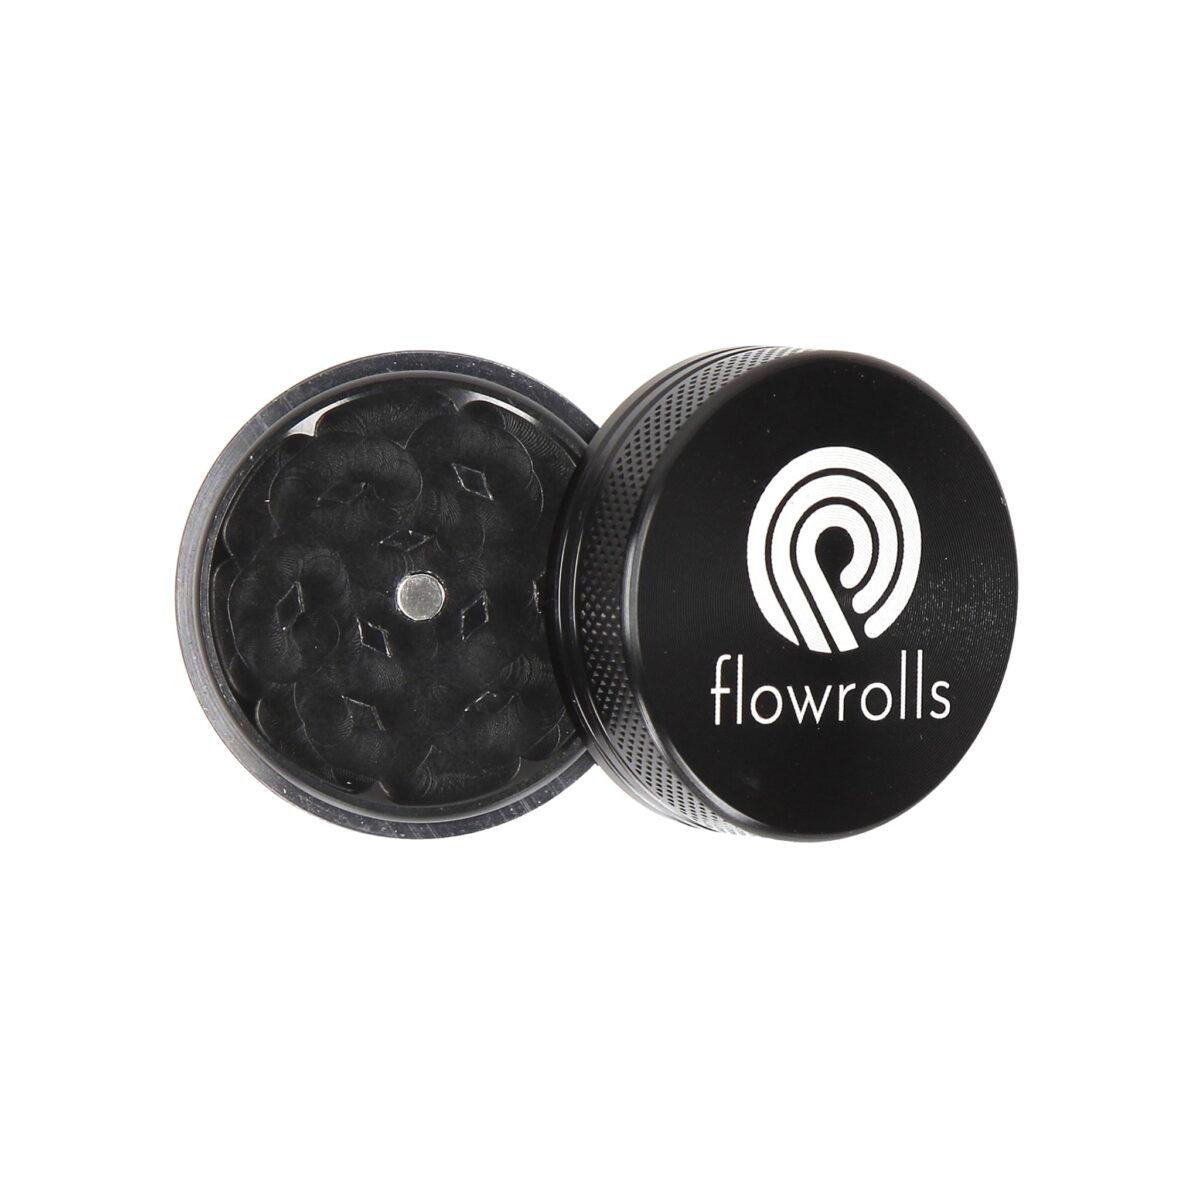 Młynek Grinder Flowrolls 40mm